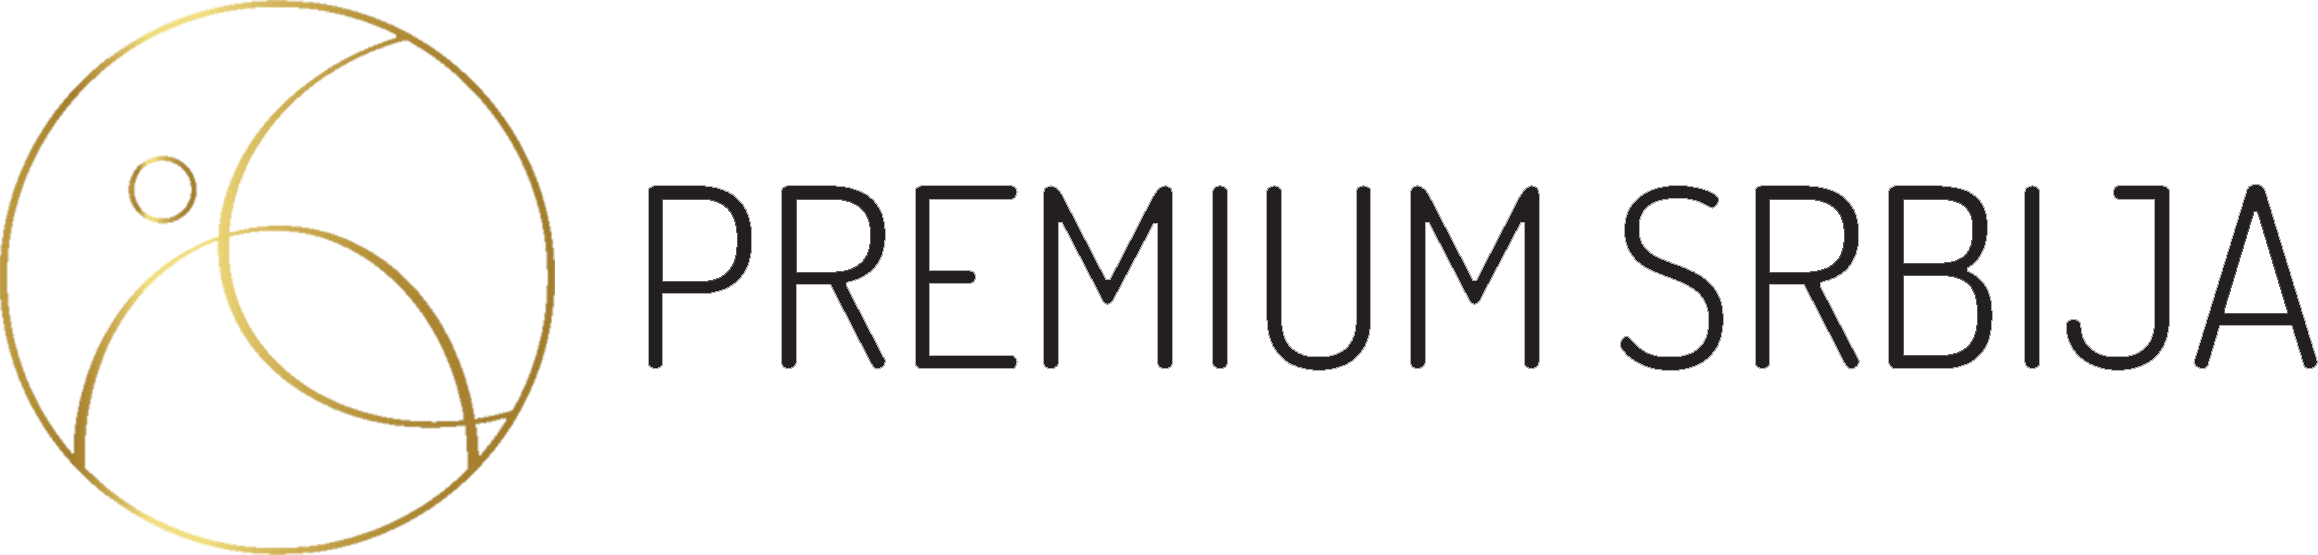 Premium Srbija